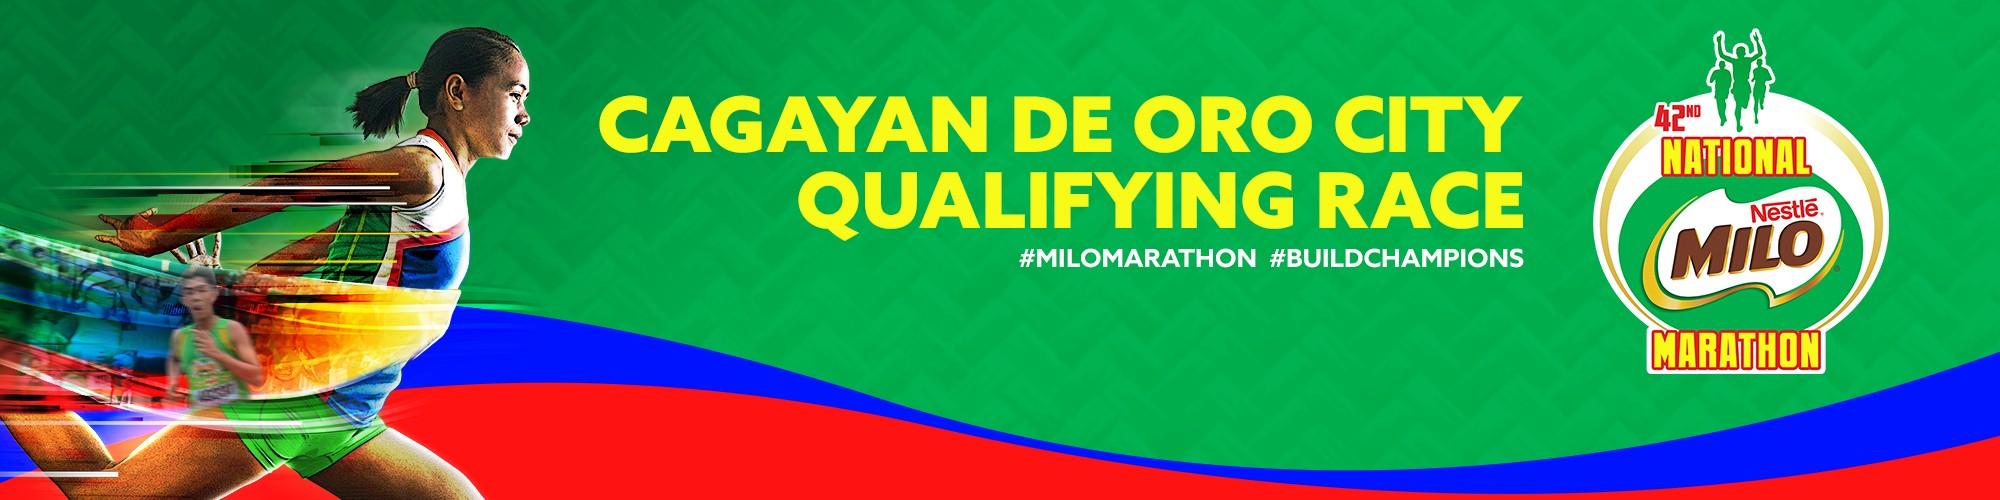 2019 National MILO Marathon CDO